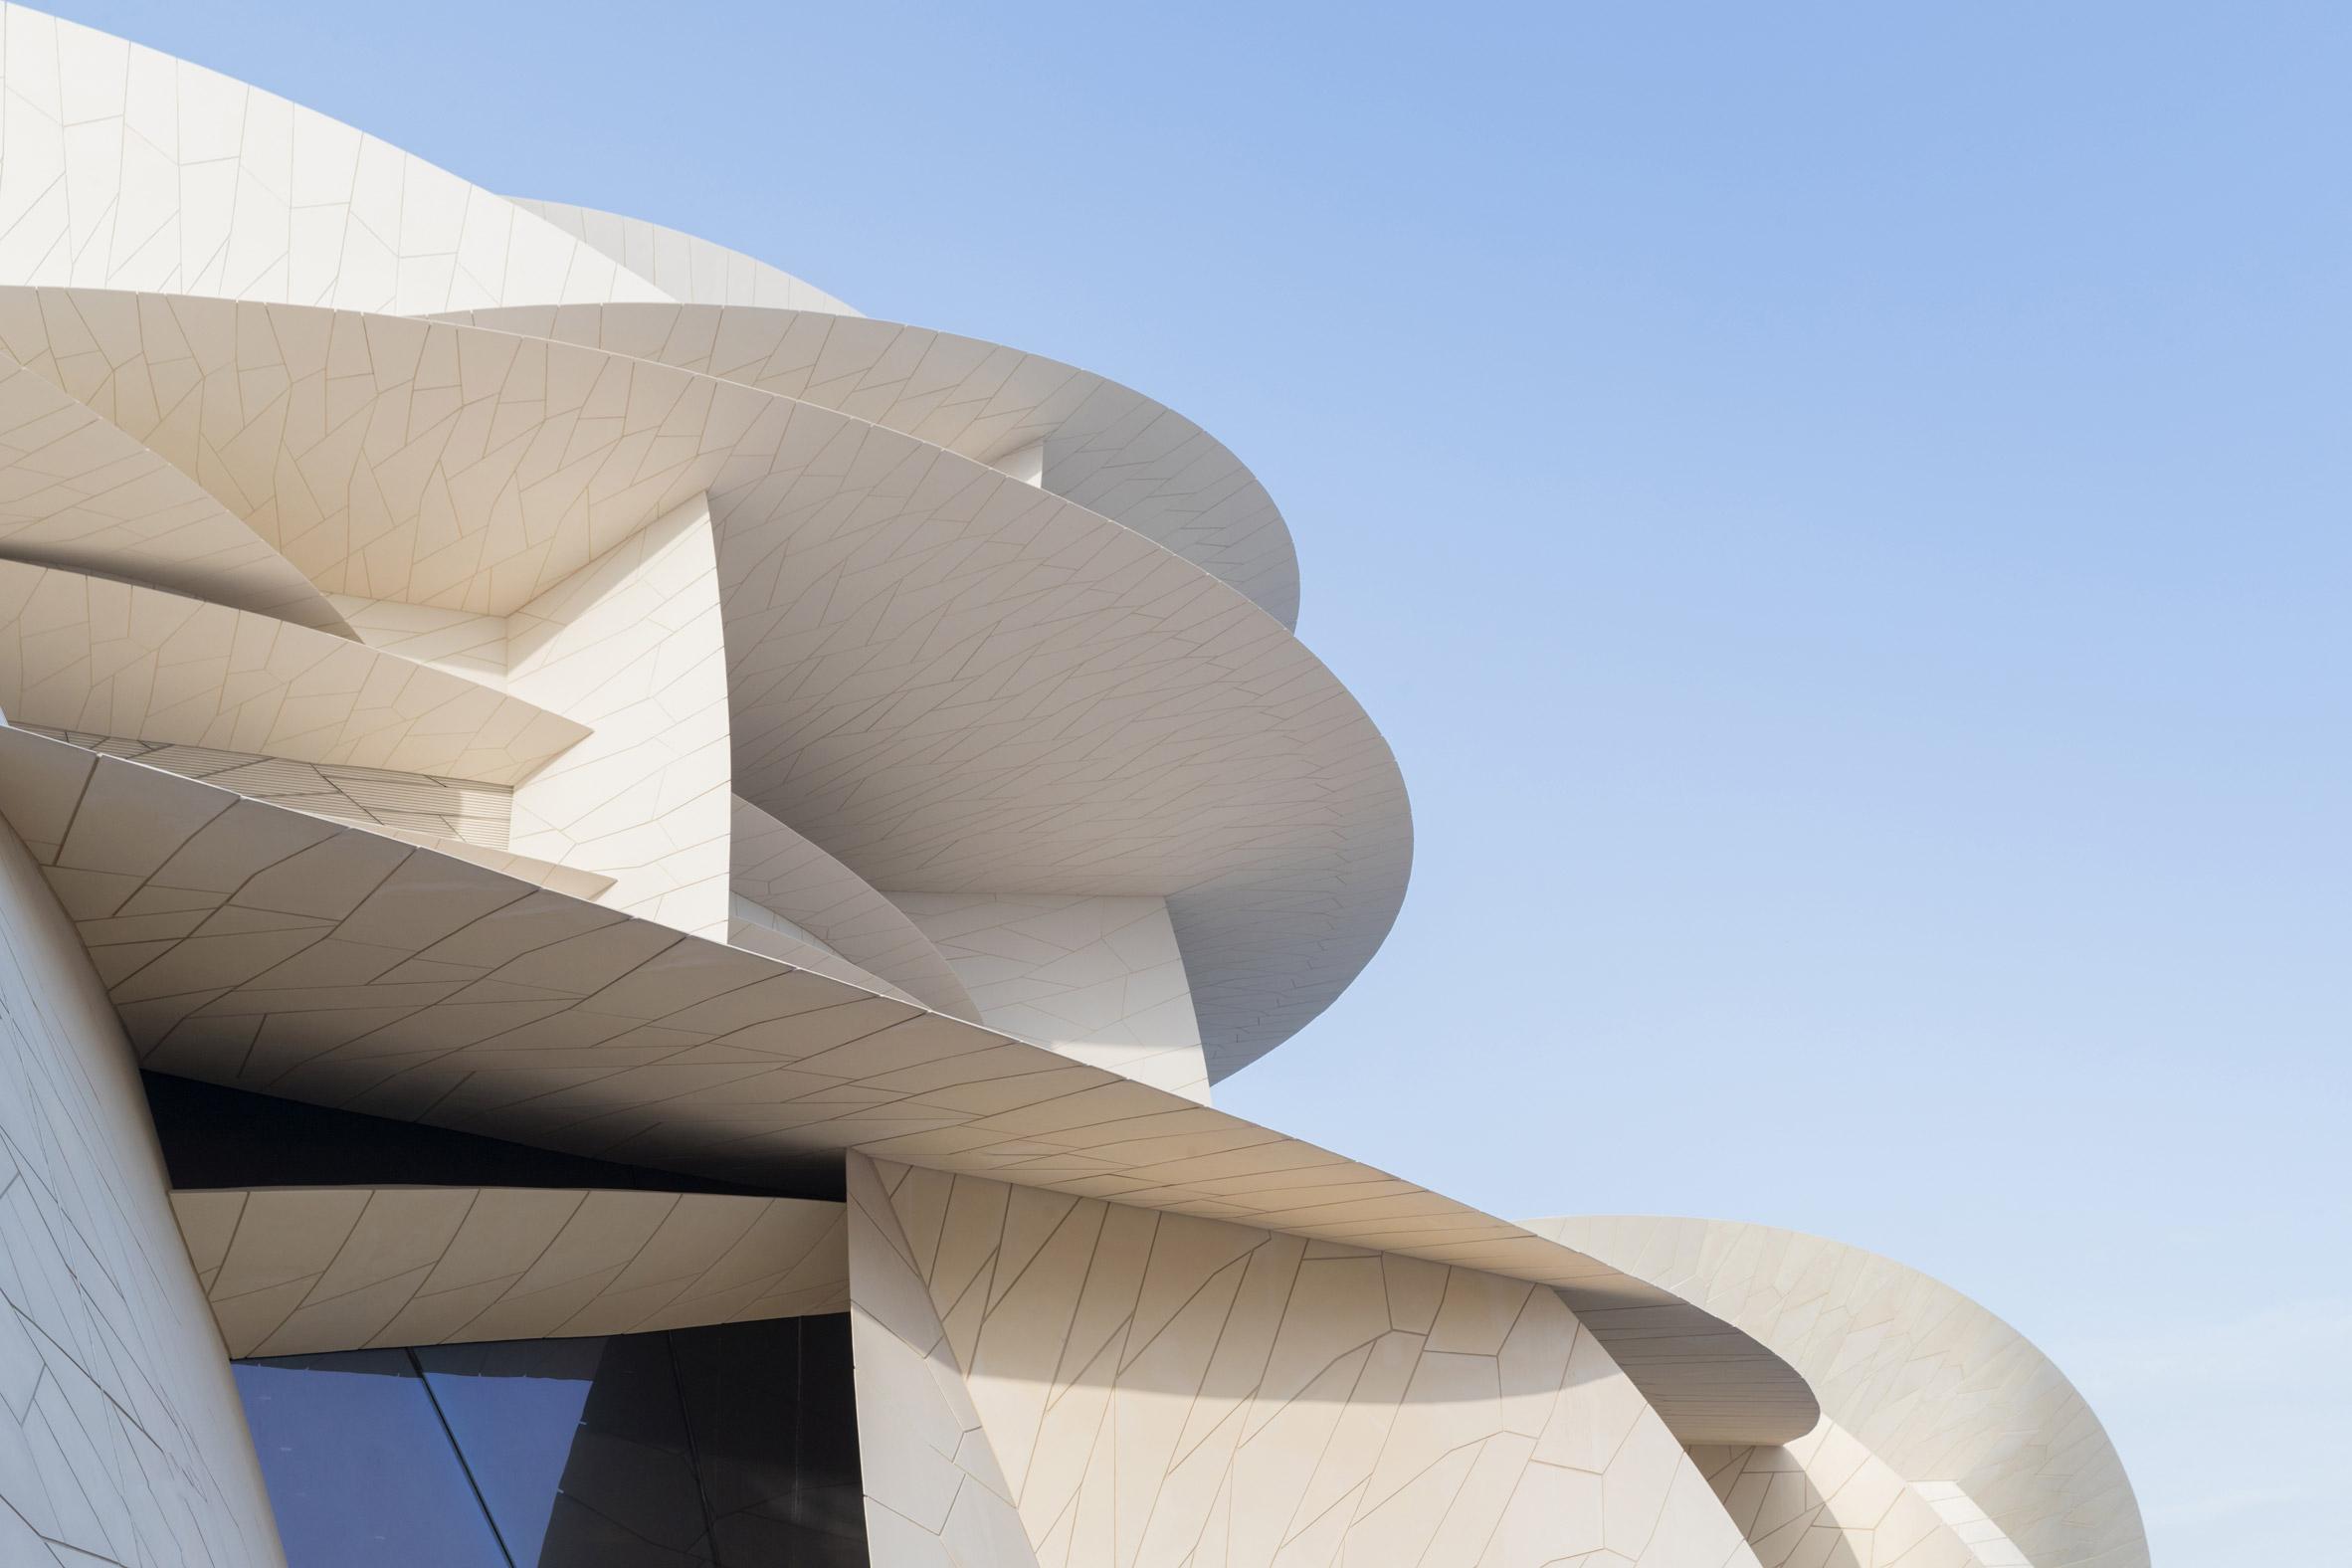 Jean-Nouvel-national-museum-qatar-Iwan-Baan_dezeen_2364_col_1.jpg